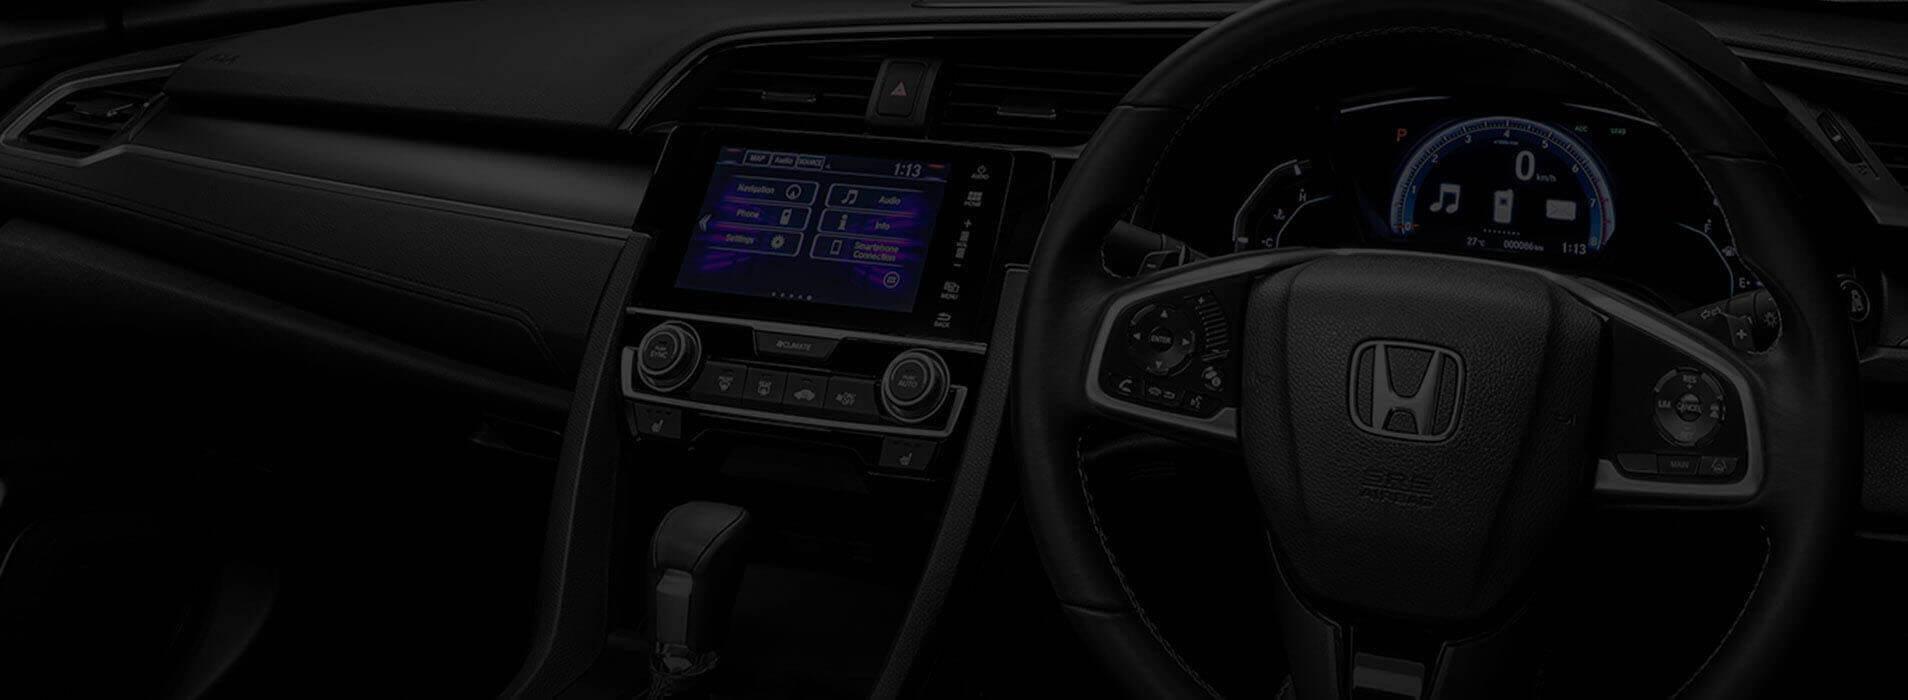 Civic Hatch Technology